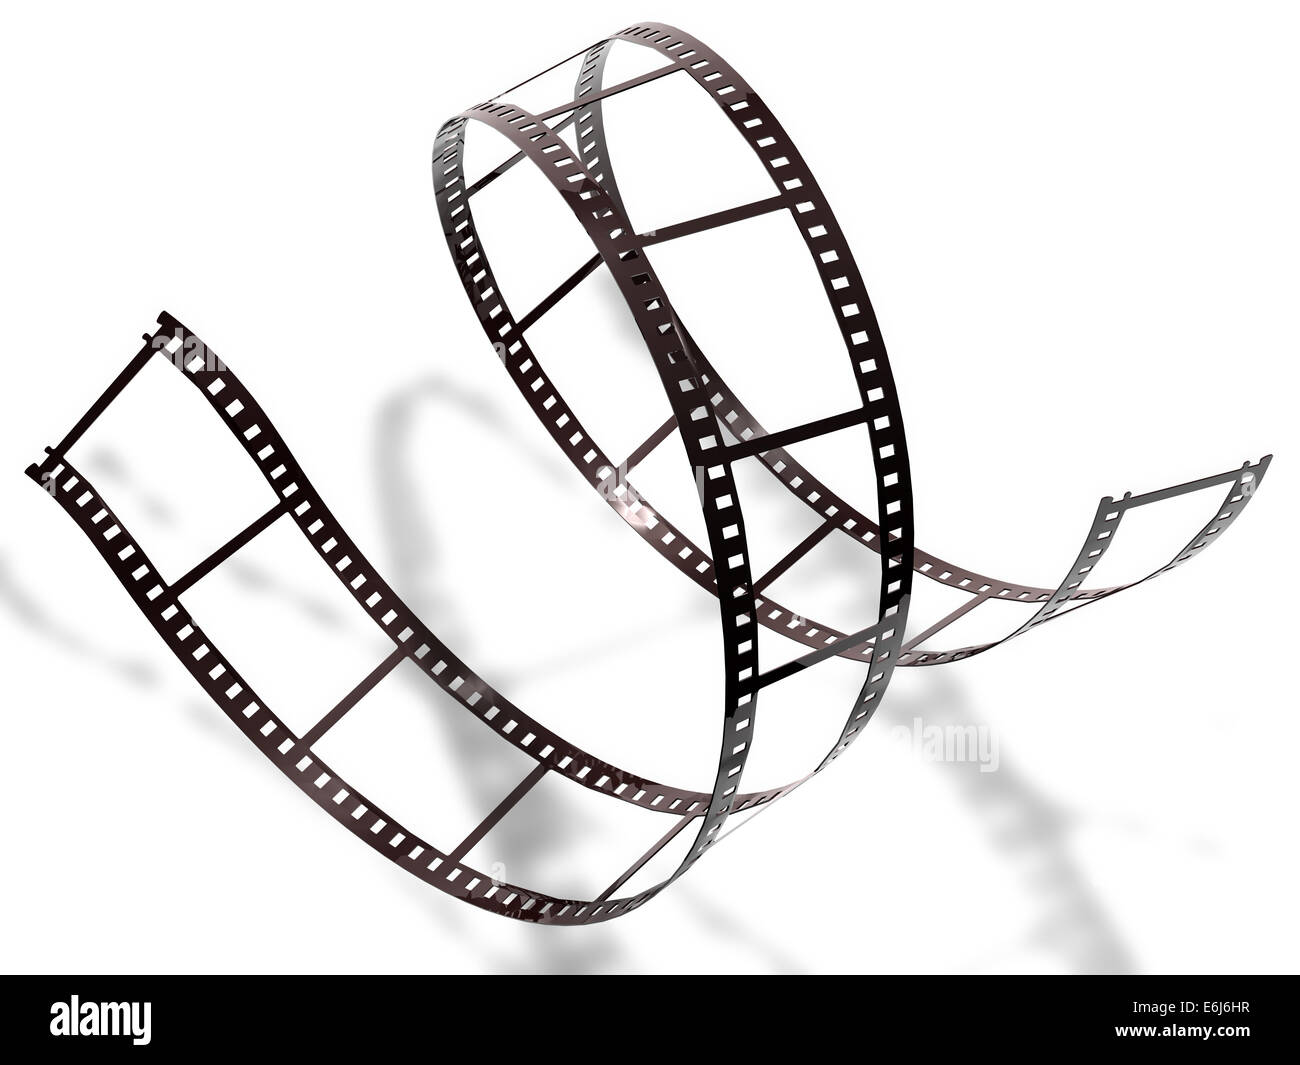 Filmstrip on white background, isolated Stock Photo